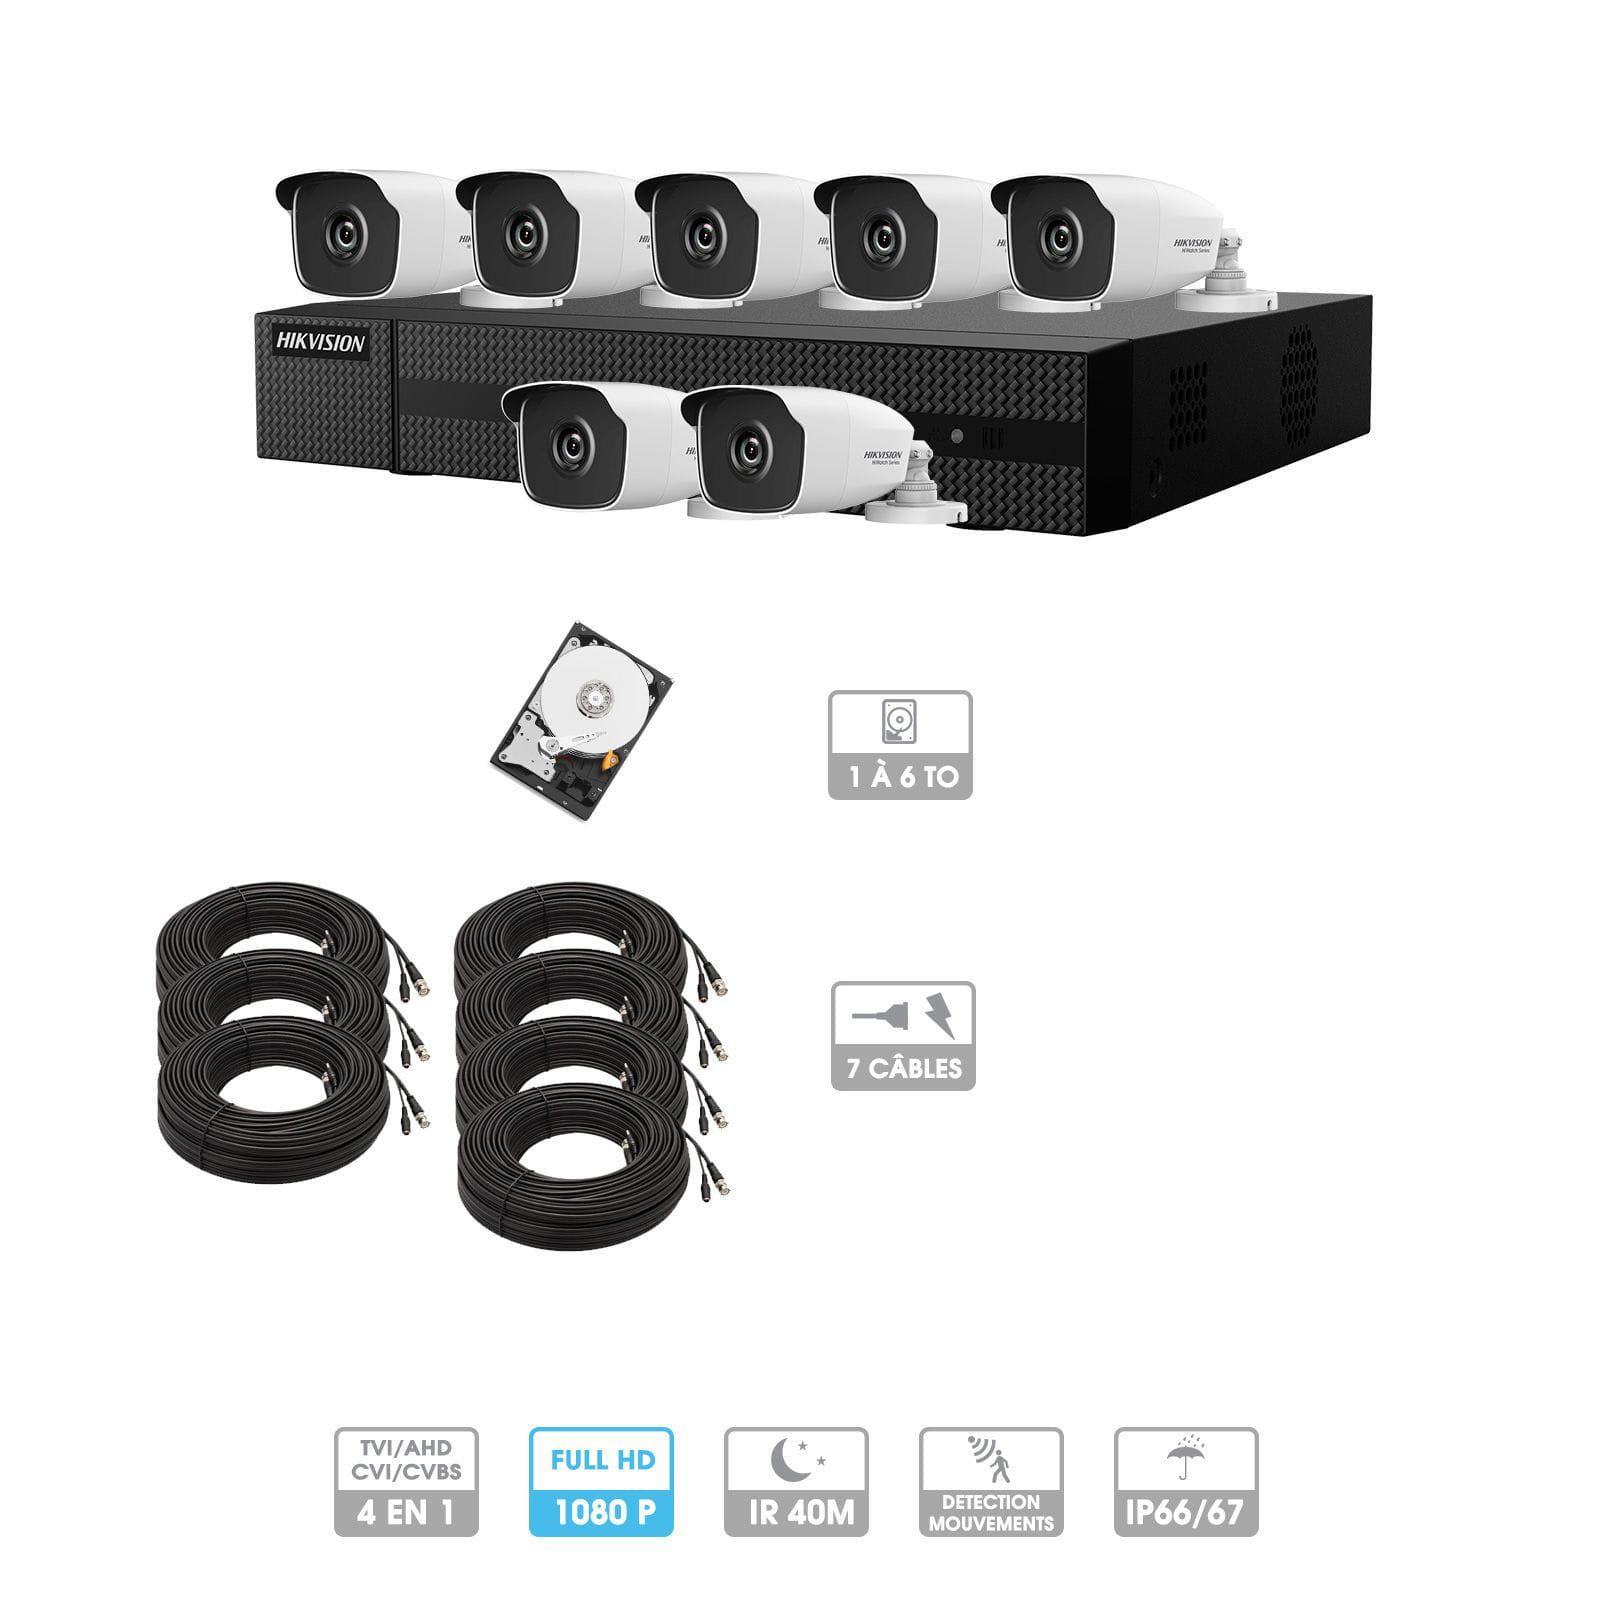 Kit vidéosurveillance 7 caméras 1080P HD | 7 câbles 20 mètres | HDD 1To | Tubes Hiwatch